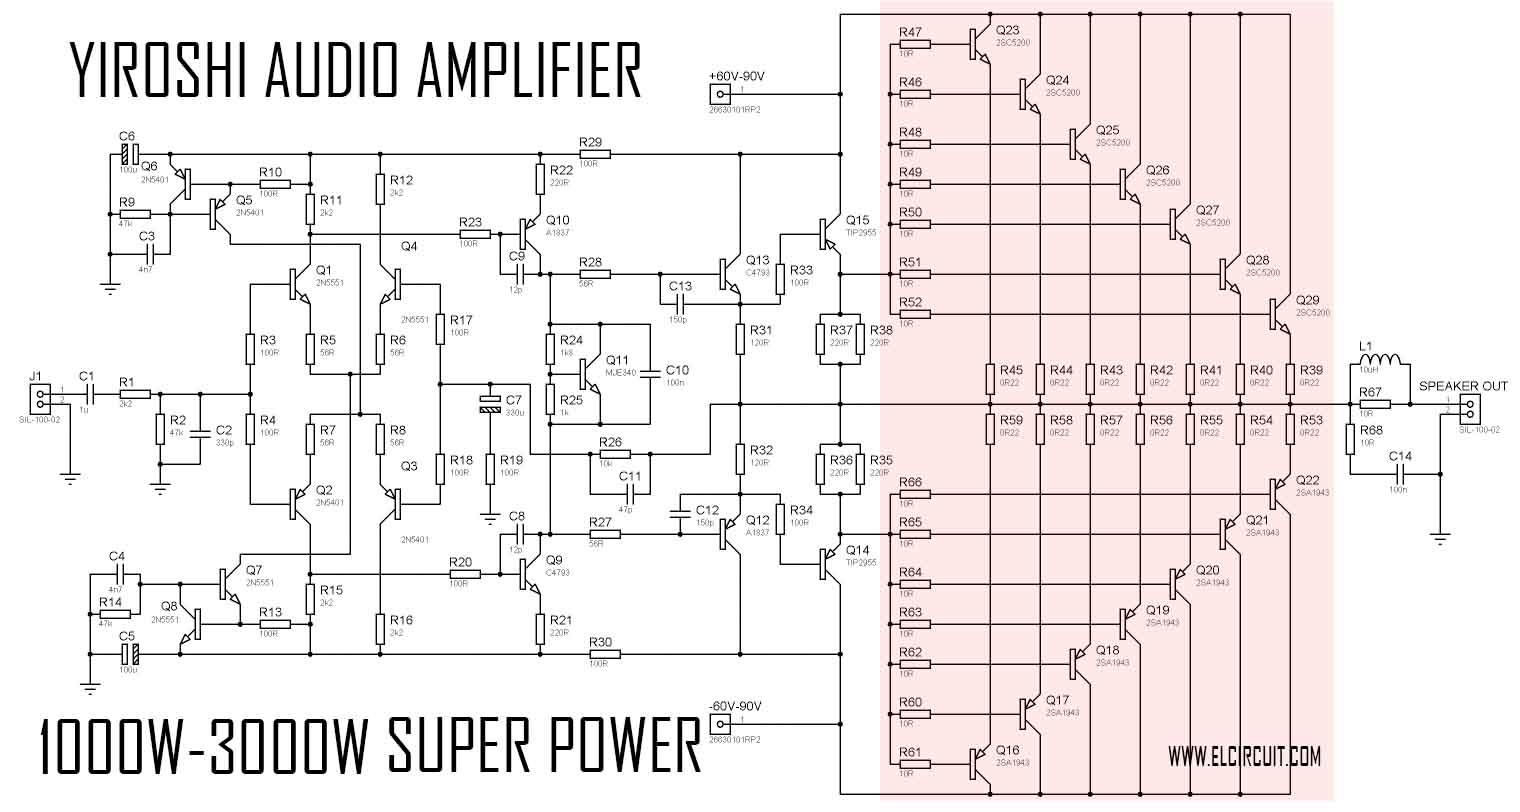 Prime 1000W Audio Amplifier Circuit Diagrams Wiring Diagram Read Wiring Cloud Overrenstrafr09Org